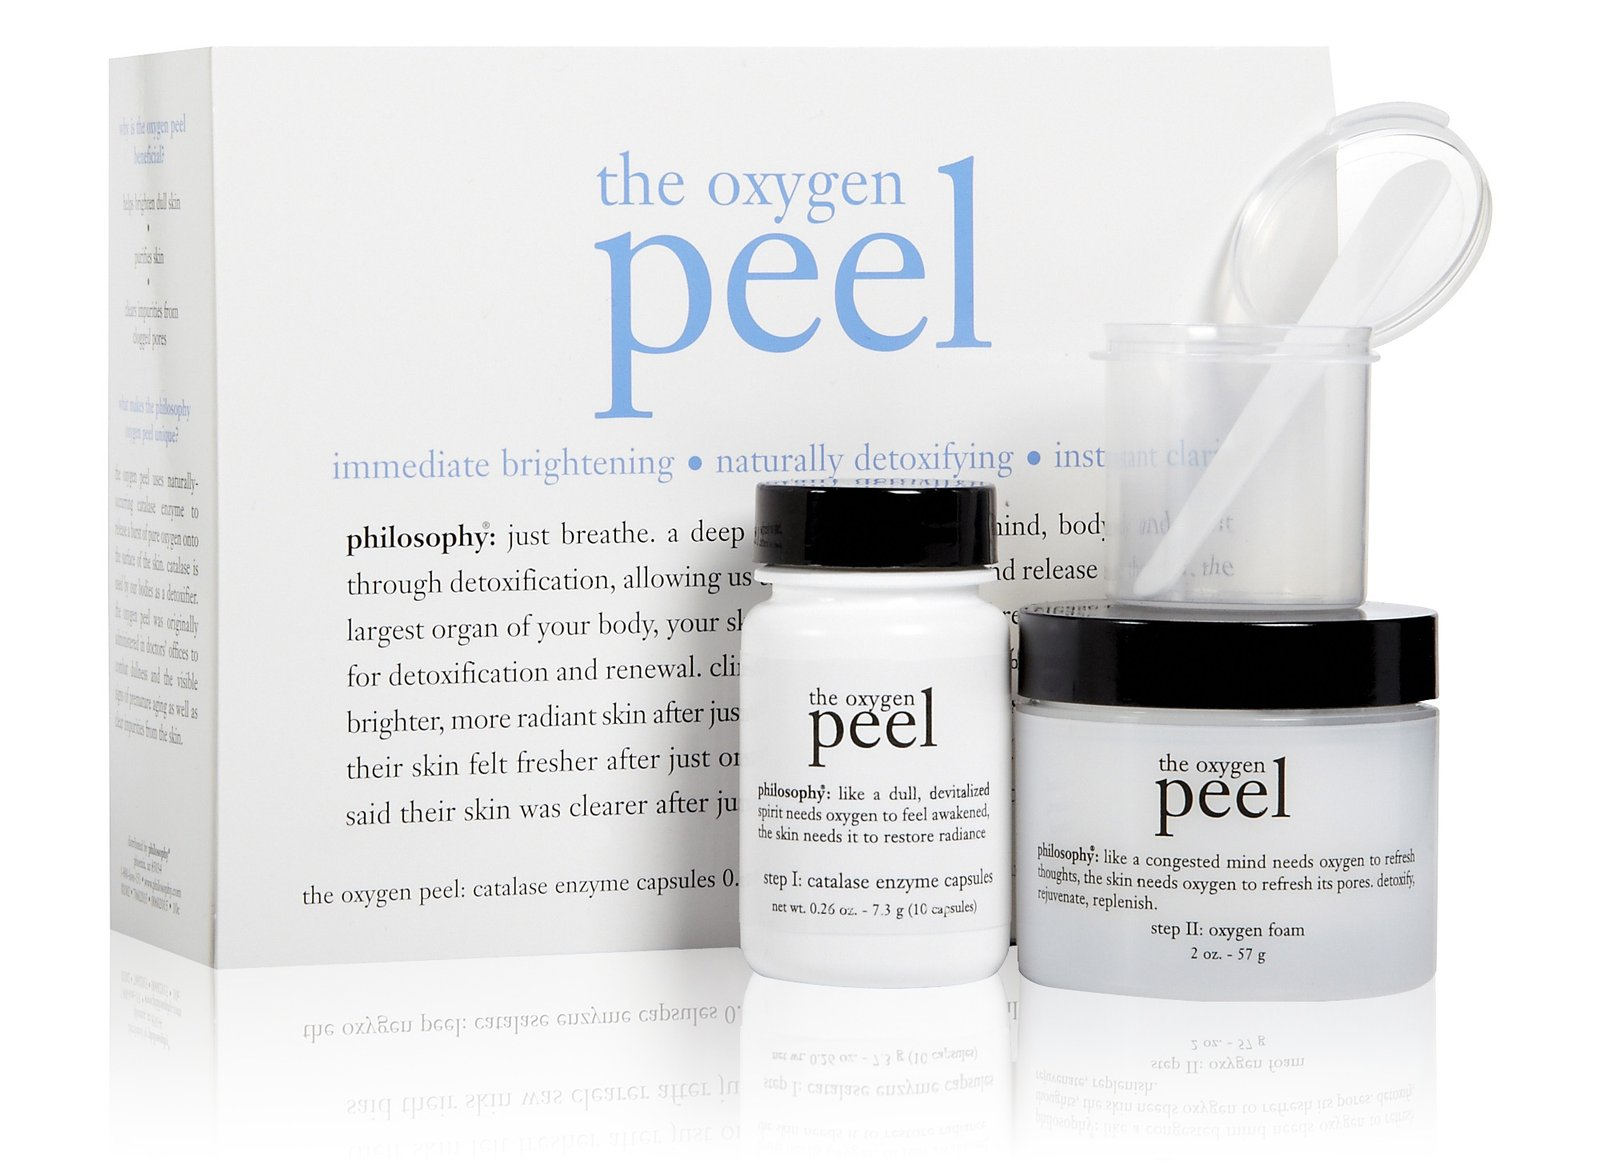 the oxygen peel philosophy